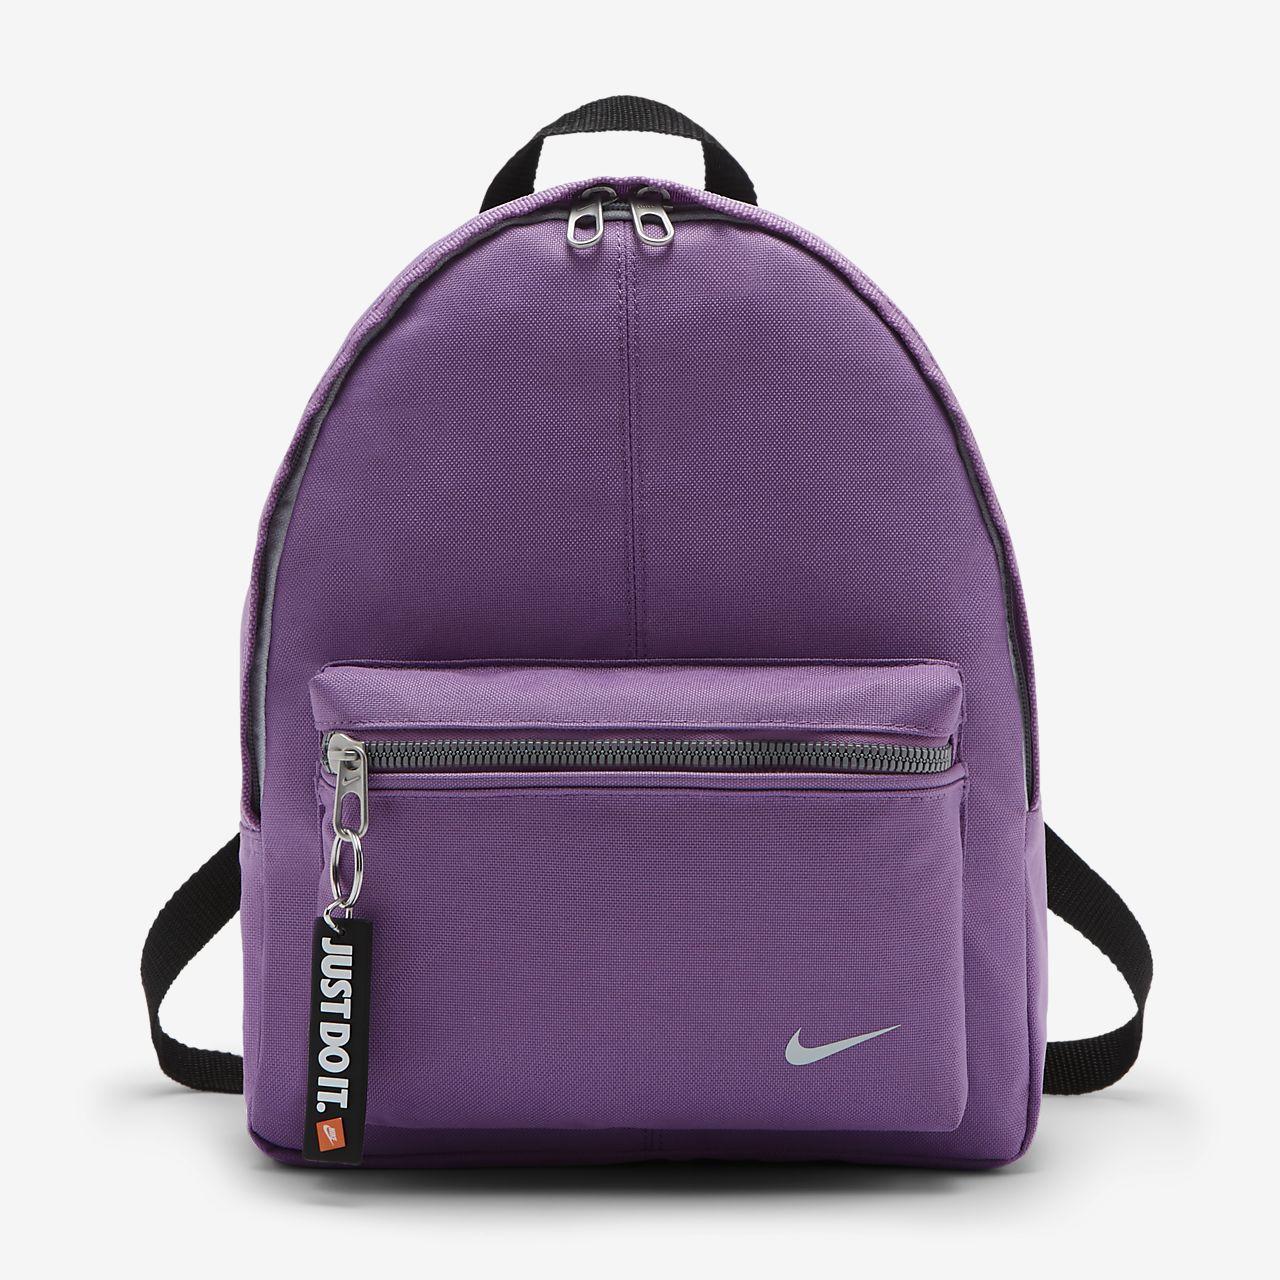 Nike kids classic backpack £9.97 delivered @ Nike